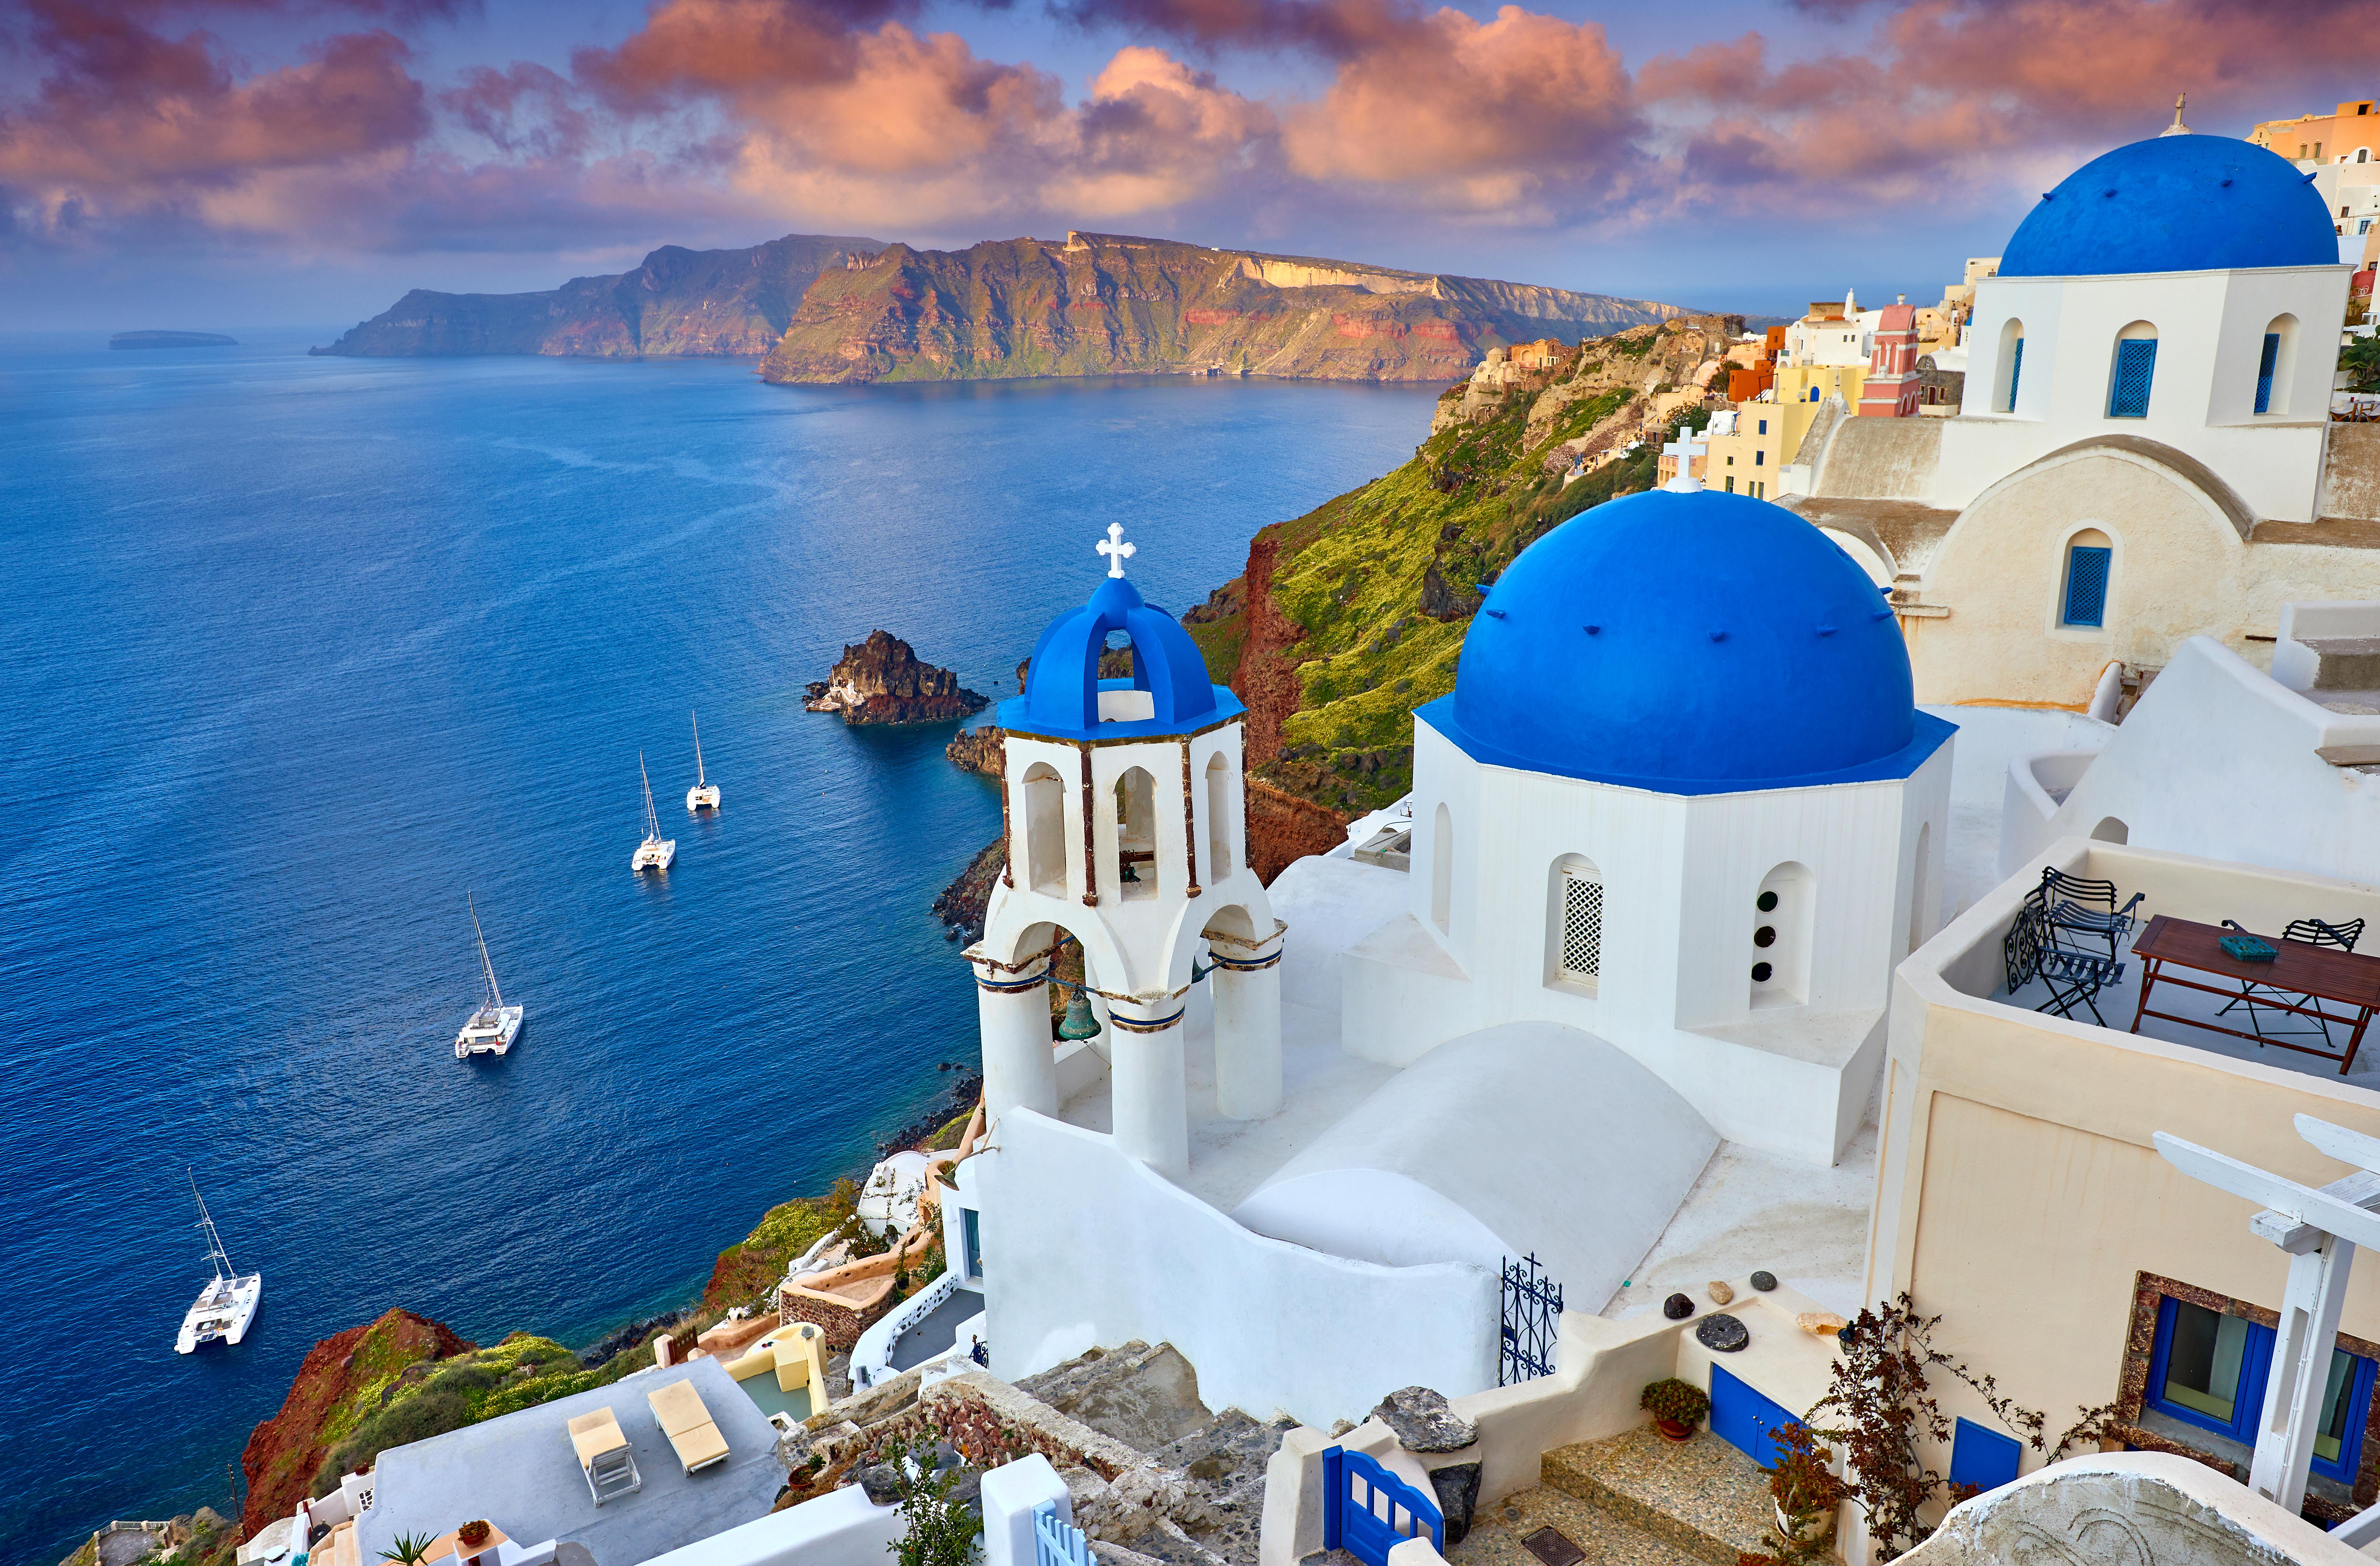 Grèce Toursime Chinois Digital marketing